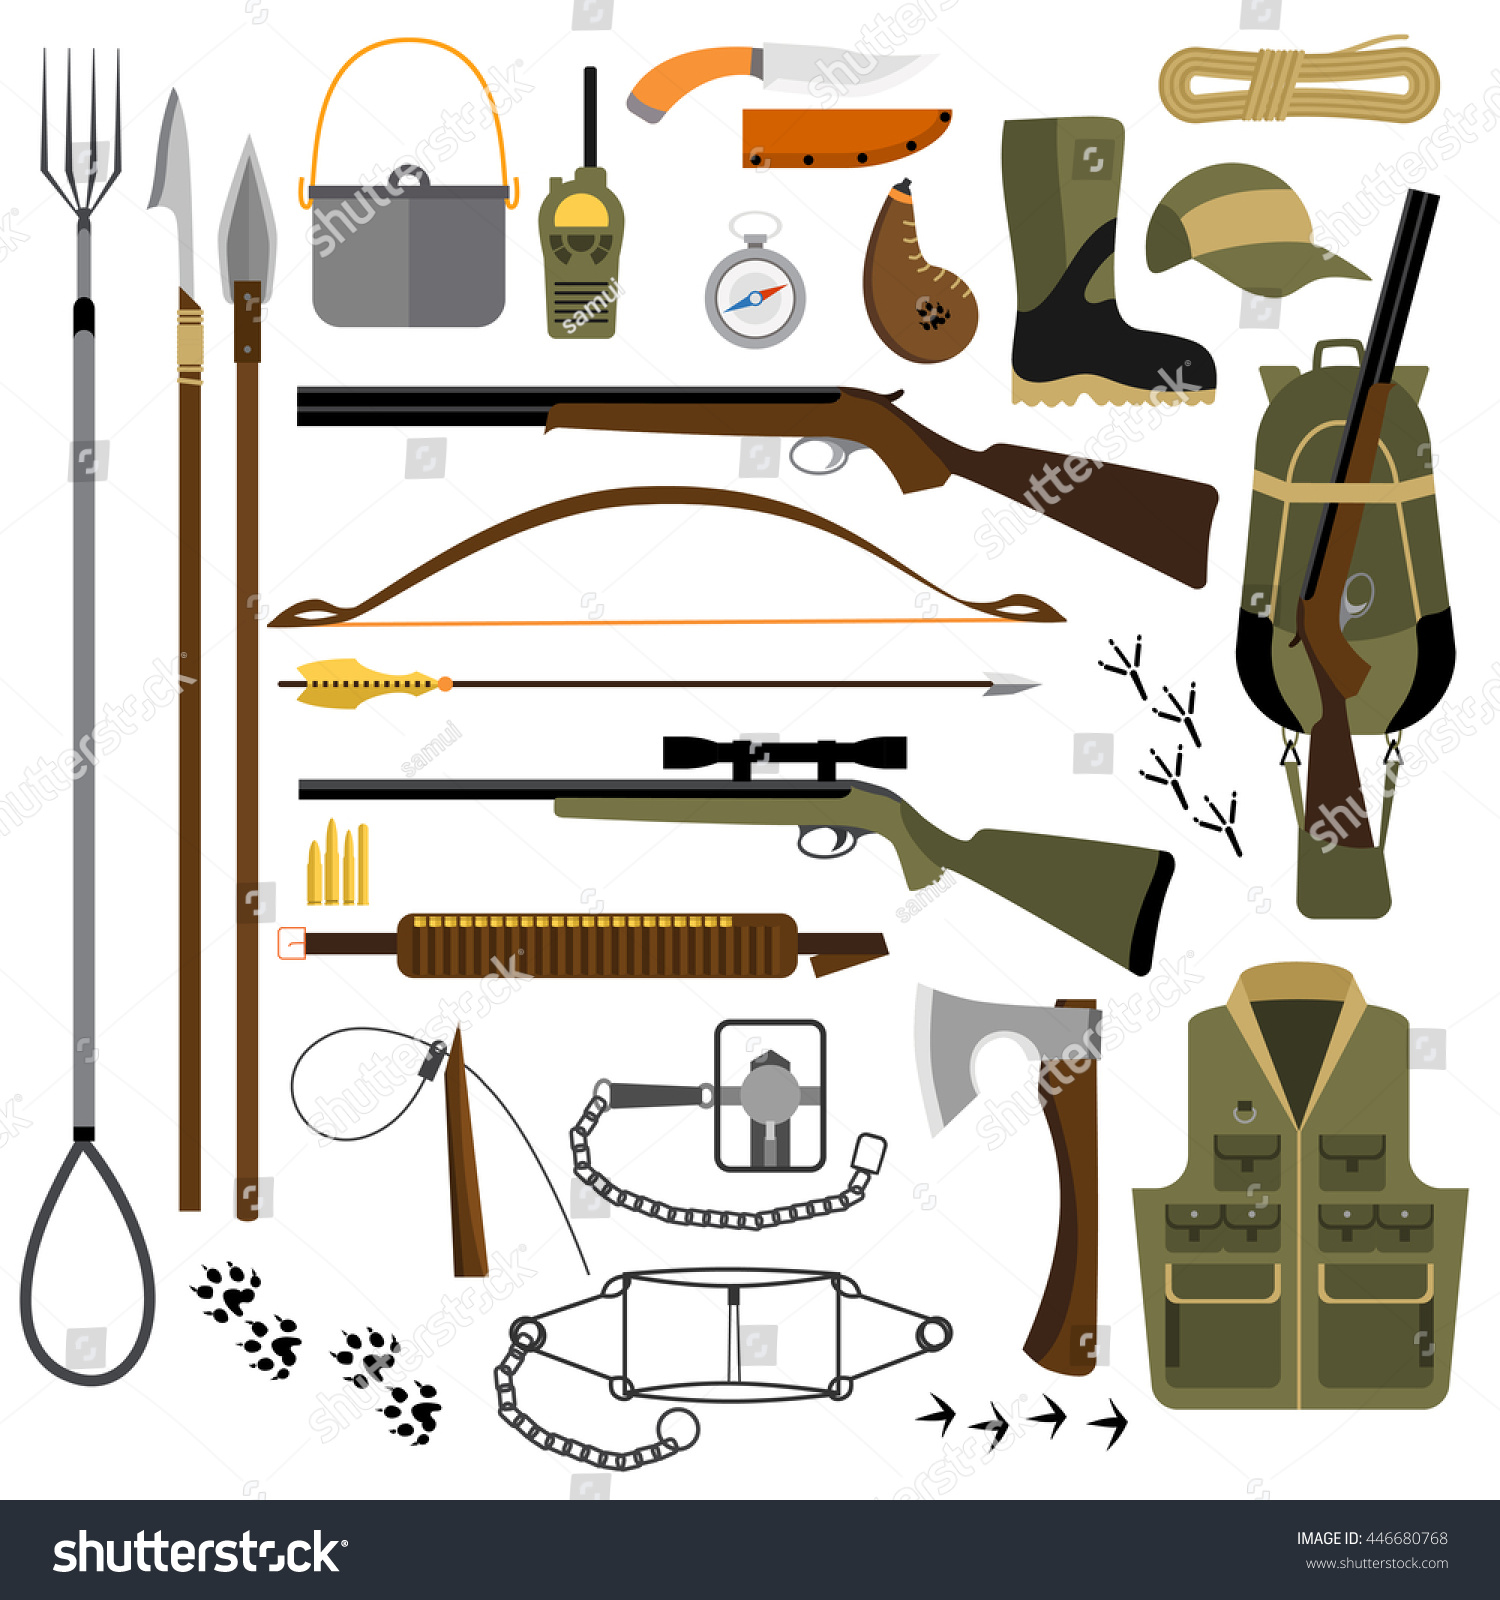 Vector Flat Illustration Hunting Fishing Gear Stock Vector ...